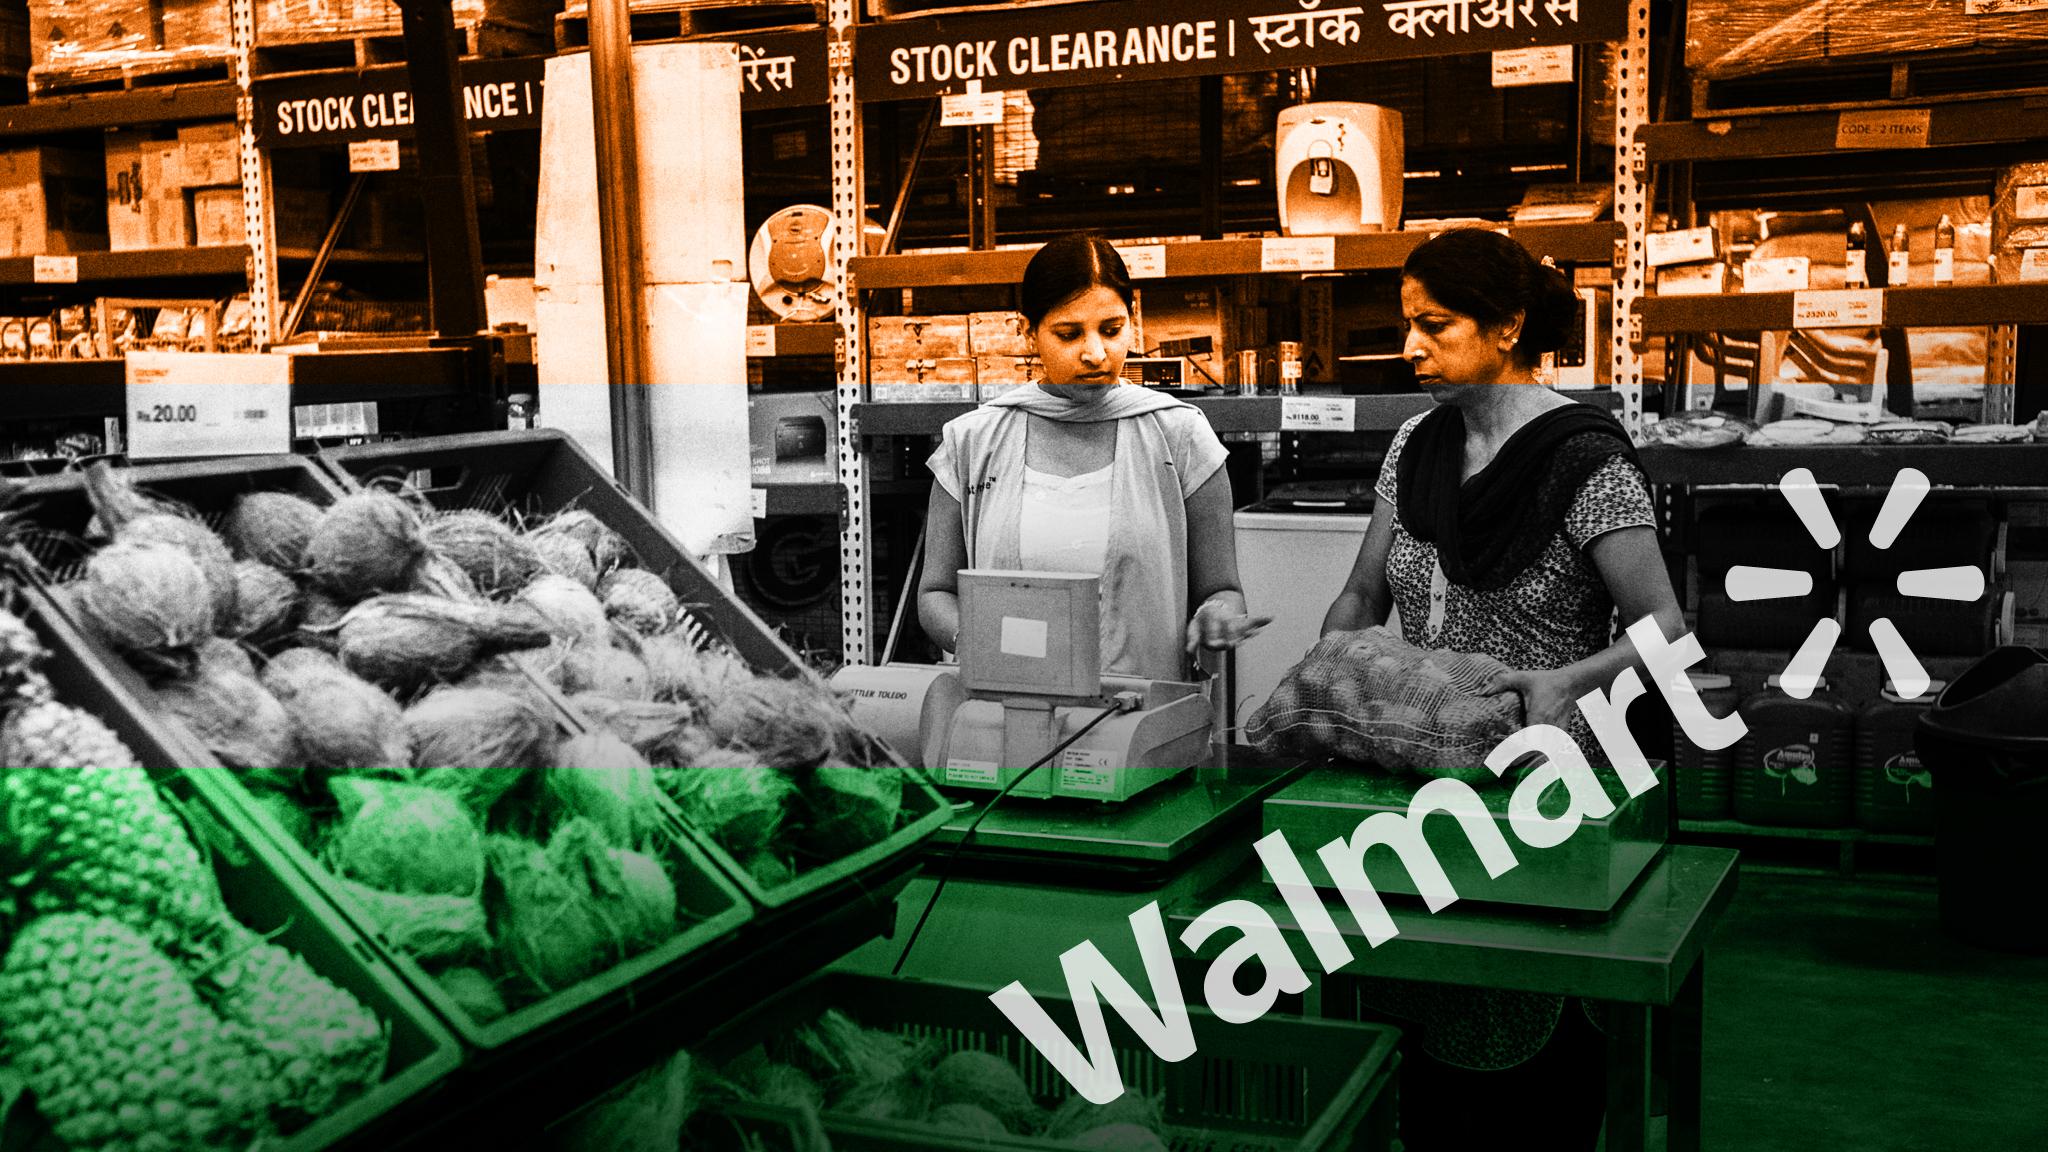 Walmart shifts global strategy to battle Amazon | Financial